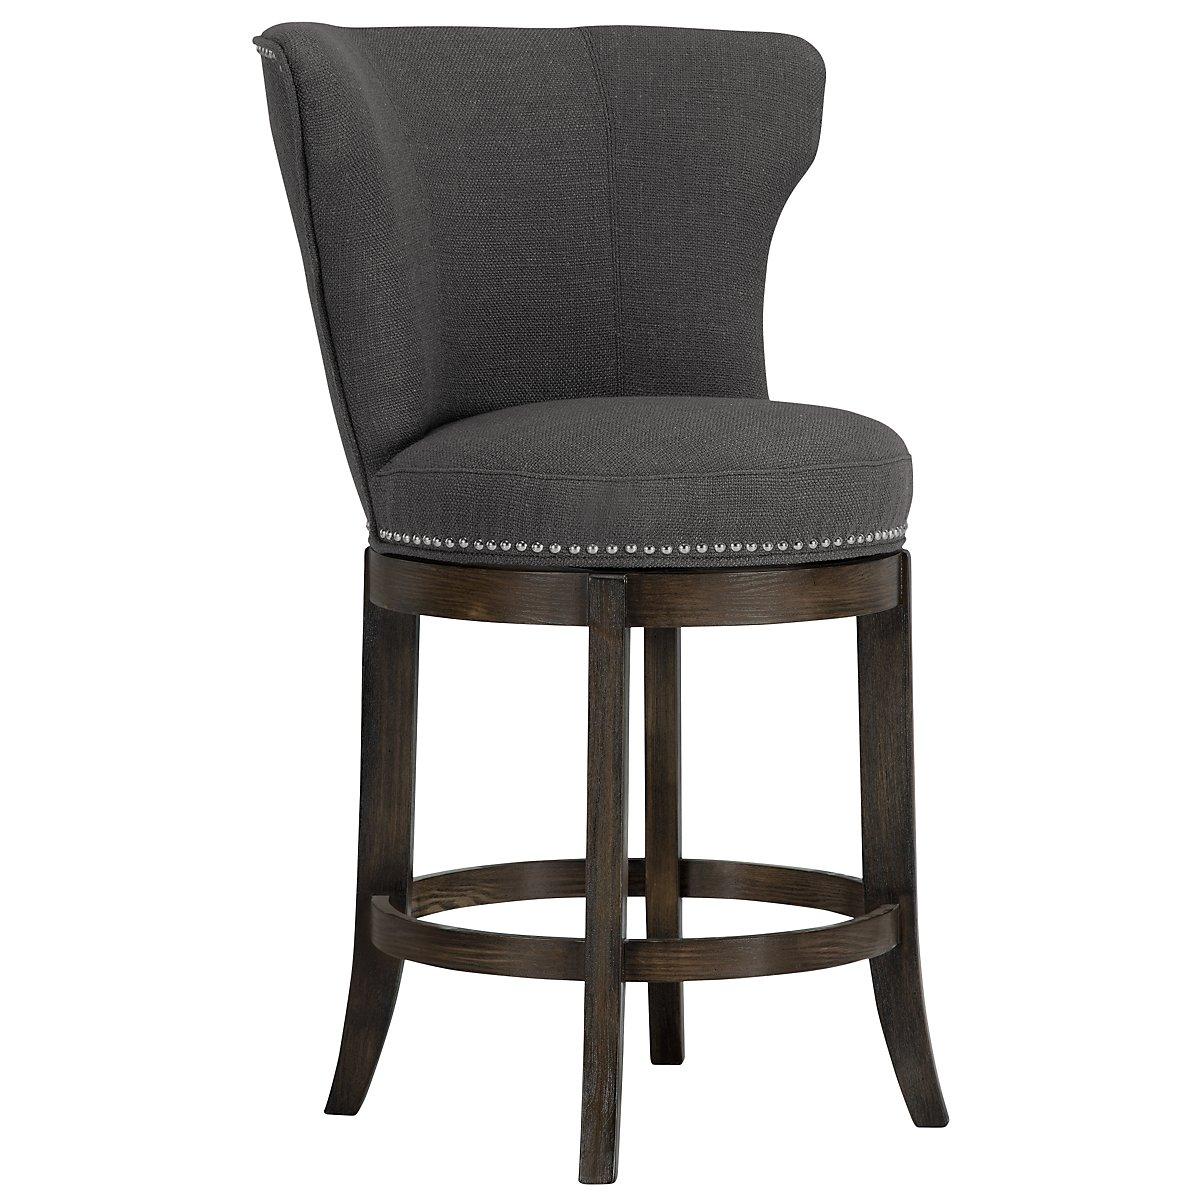 City Furniture Cayden Dk Gray Fabric 24 Quot Barstool